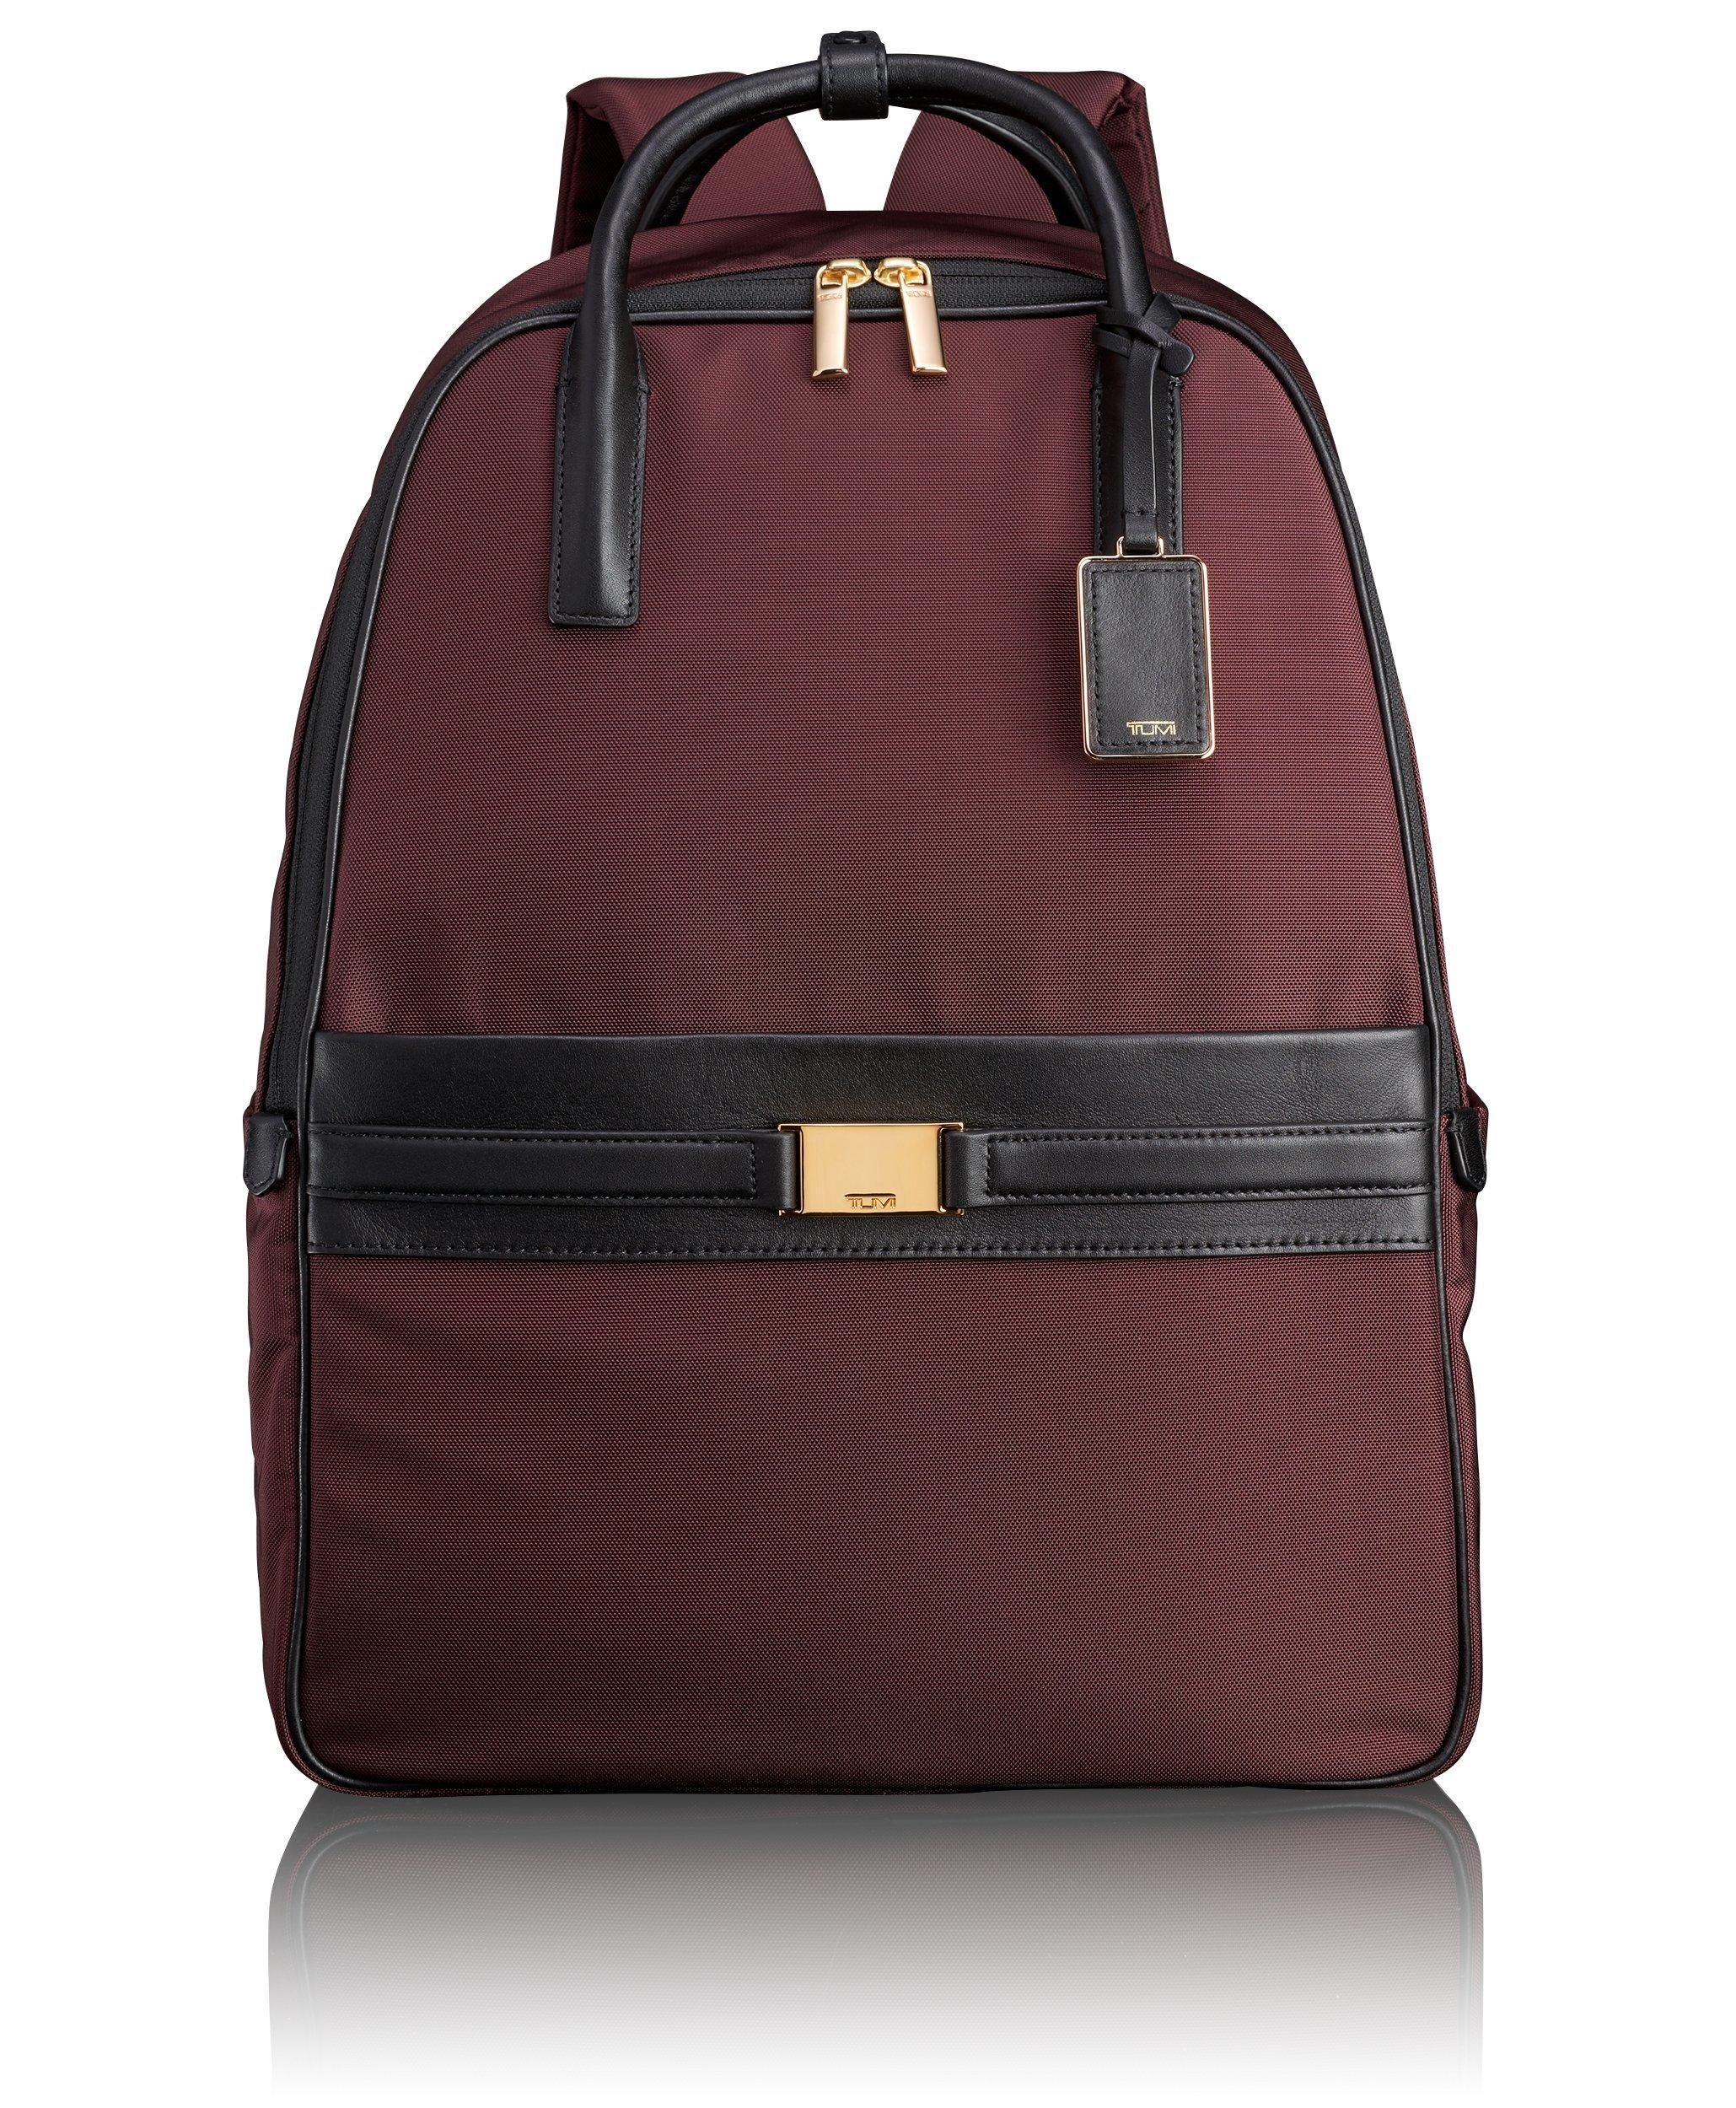 Tumi Larkin Paterson Convertible Backpack, Bordeaux